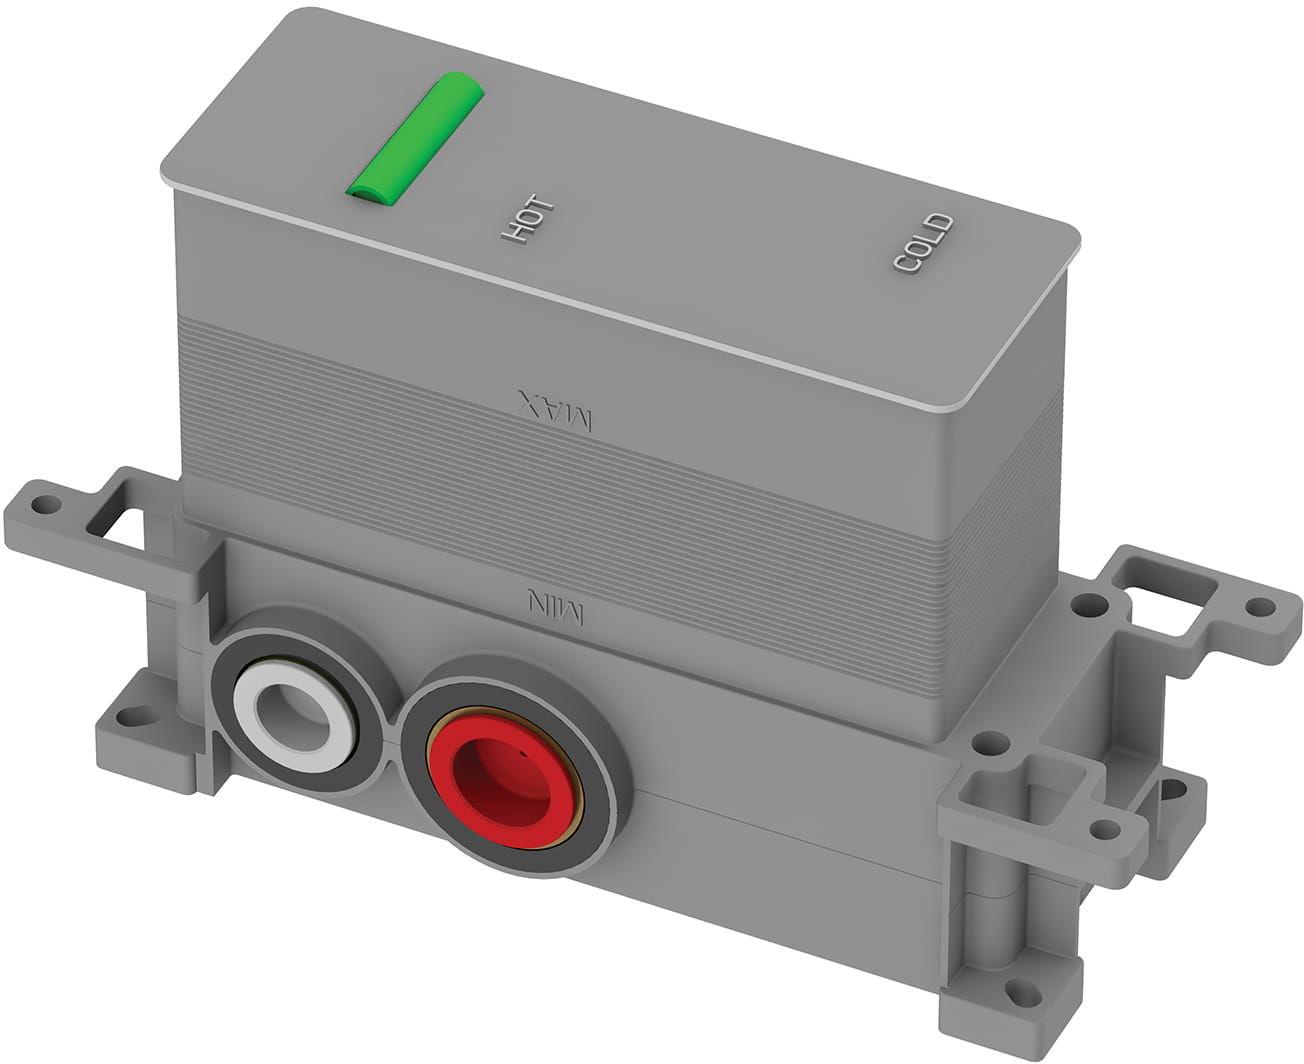 Omnires Element podtynkowy termostatycznej baterii 2-wyjściowej Y1236/KROCR, Y1236ROCR, Y1236ROBL, Y1236ROGL BOXTE2F